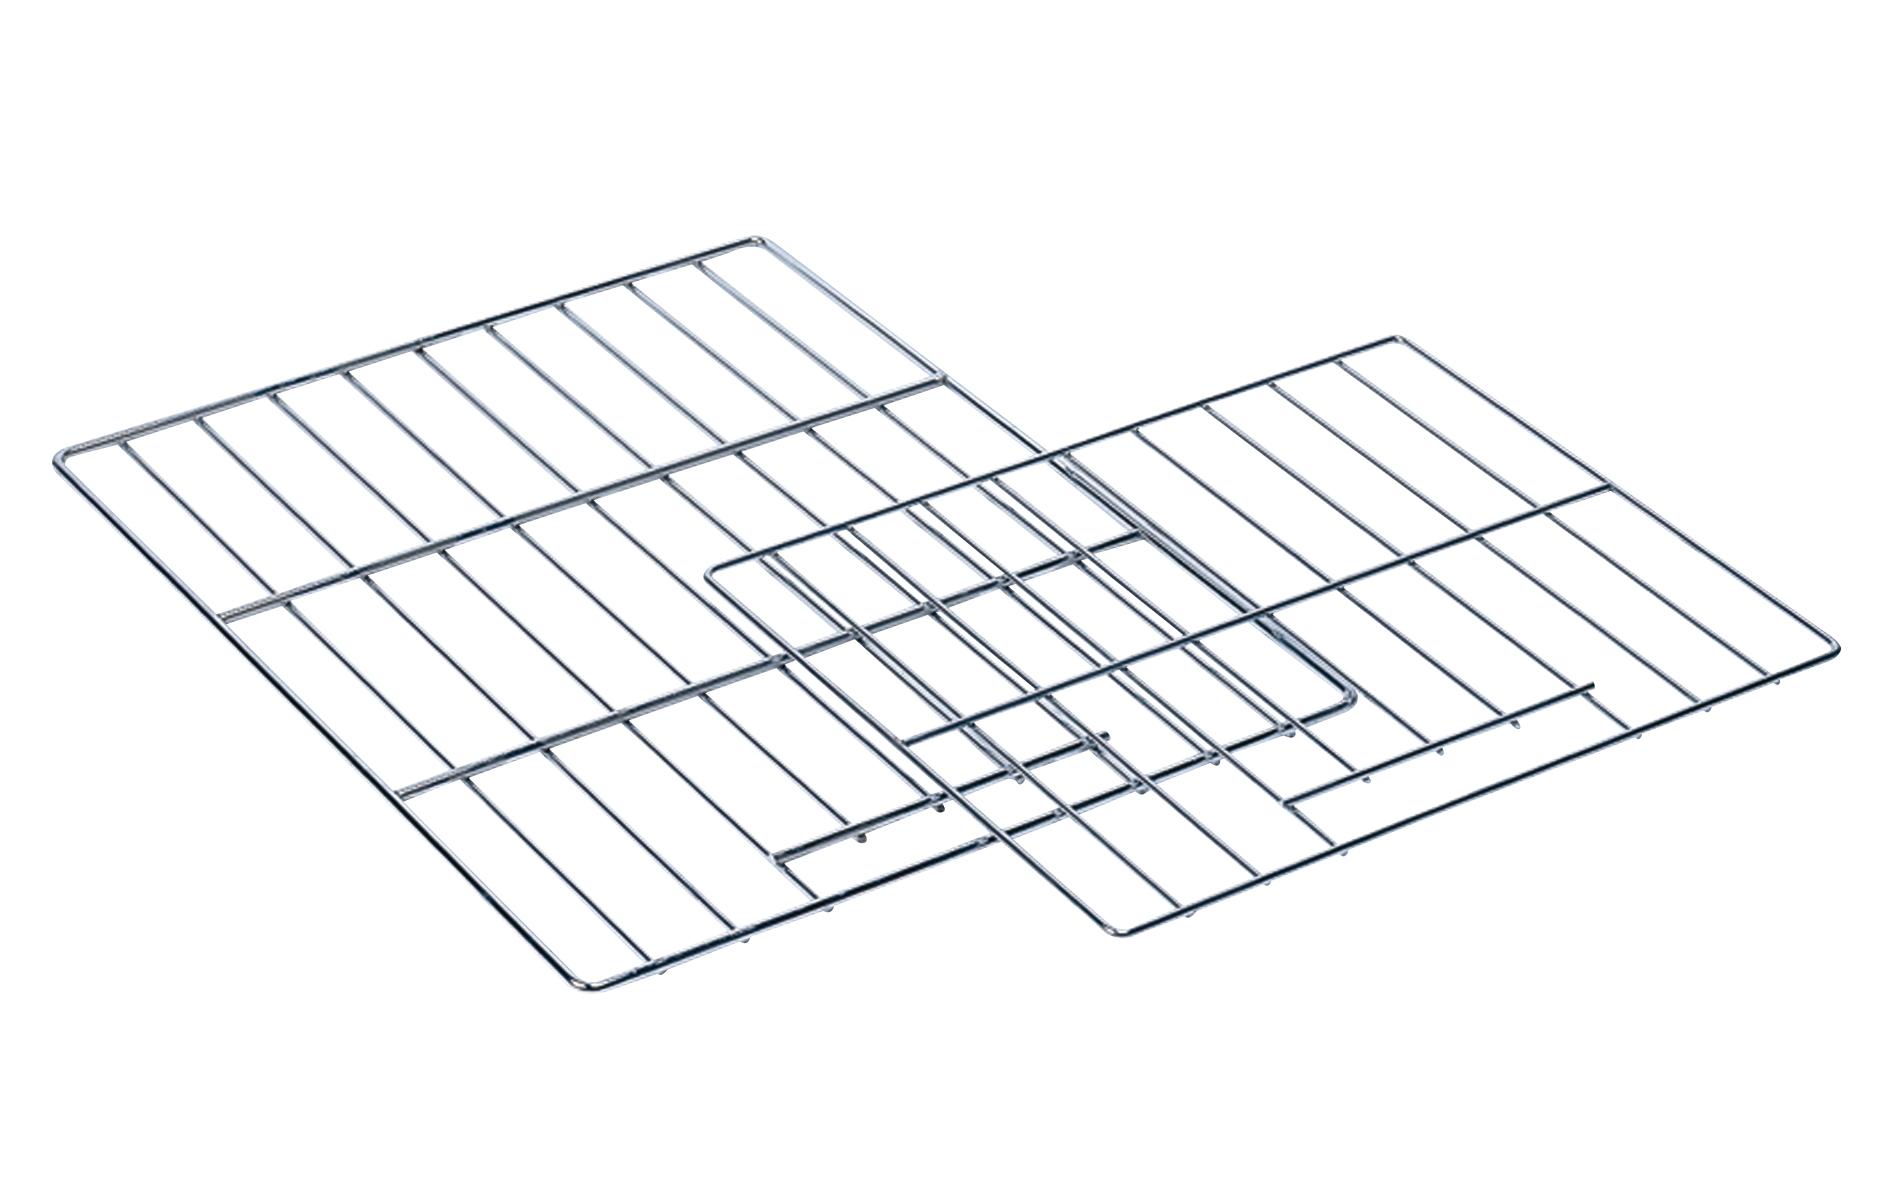 Eurast 37710000 Rejilla de acero inox en 400x600 - 400x600 mm